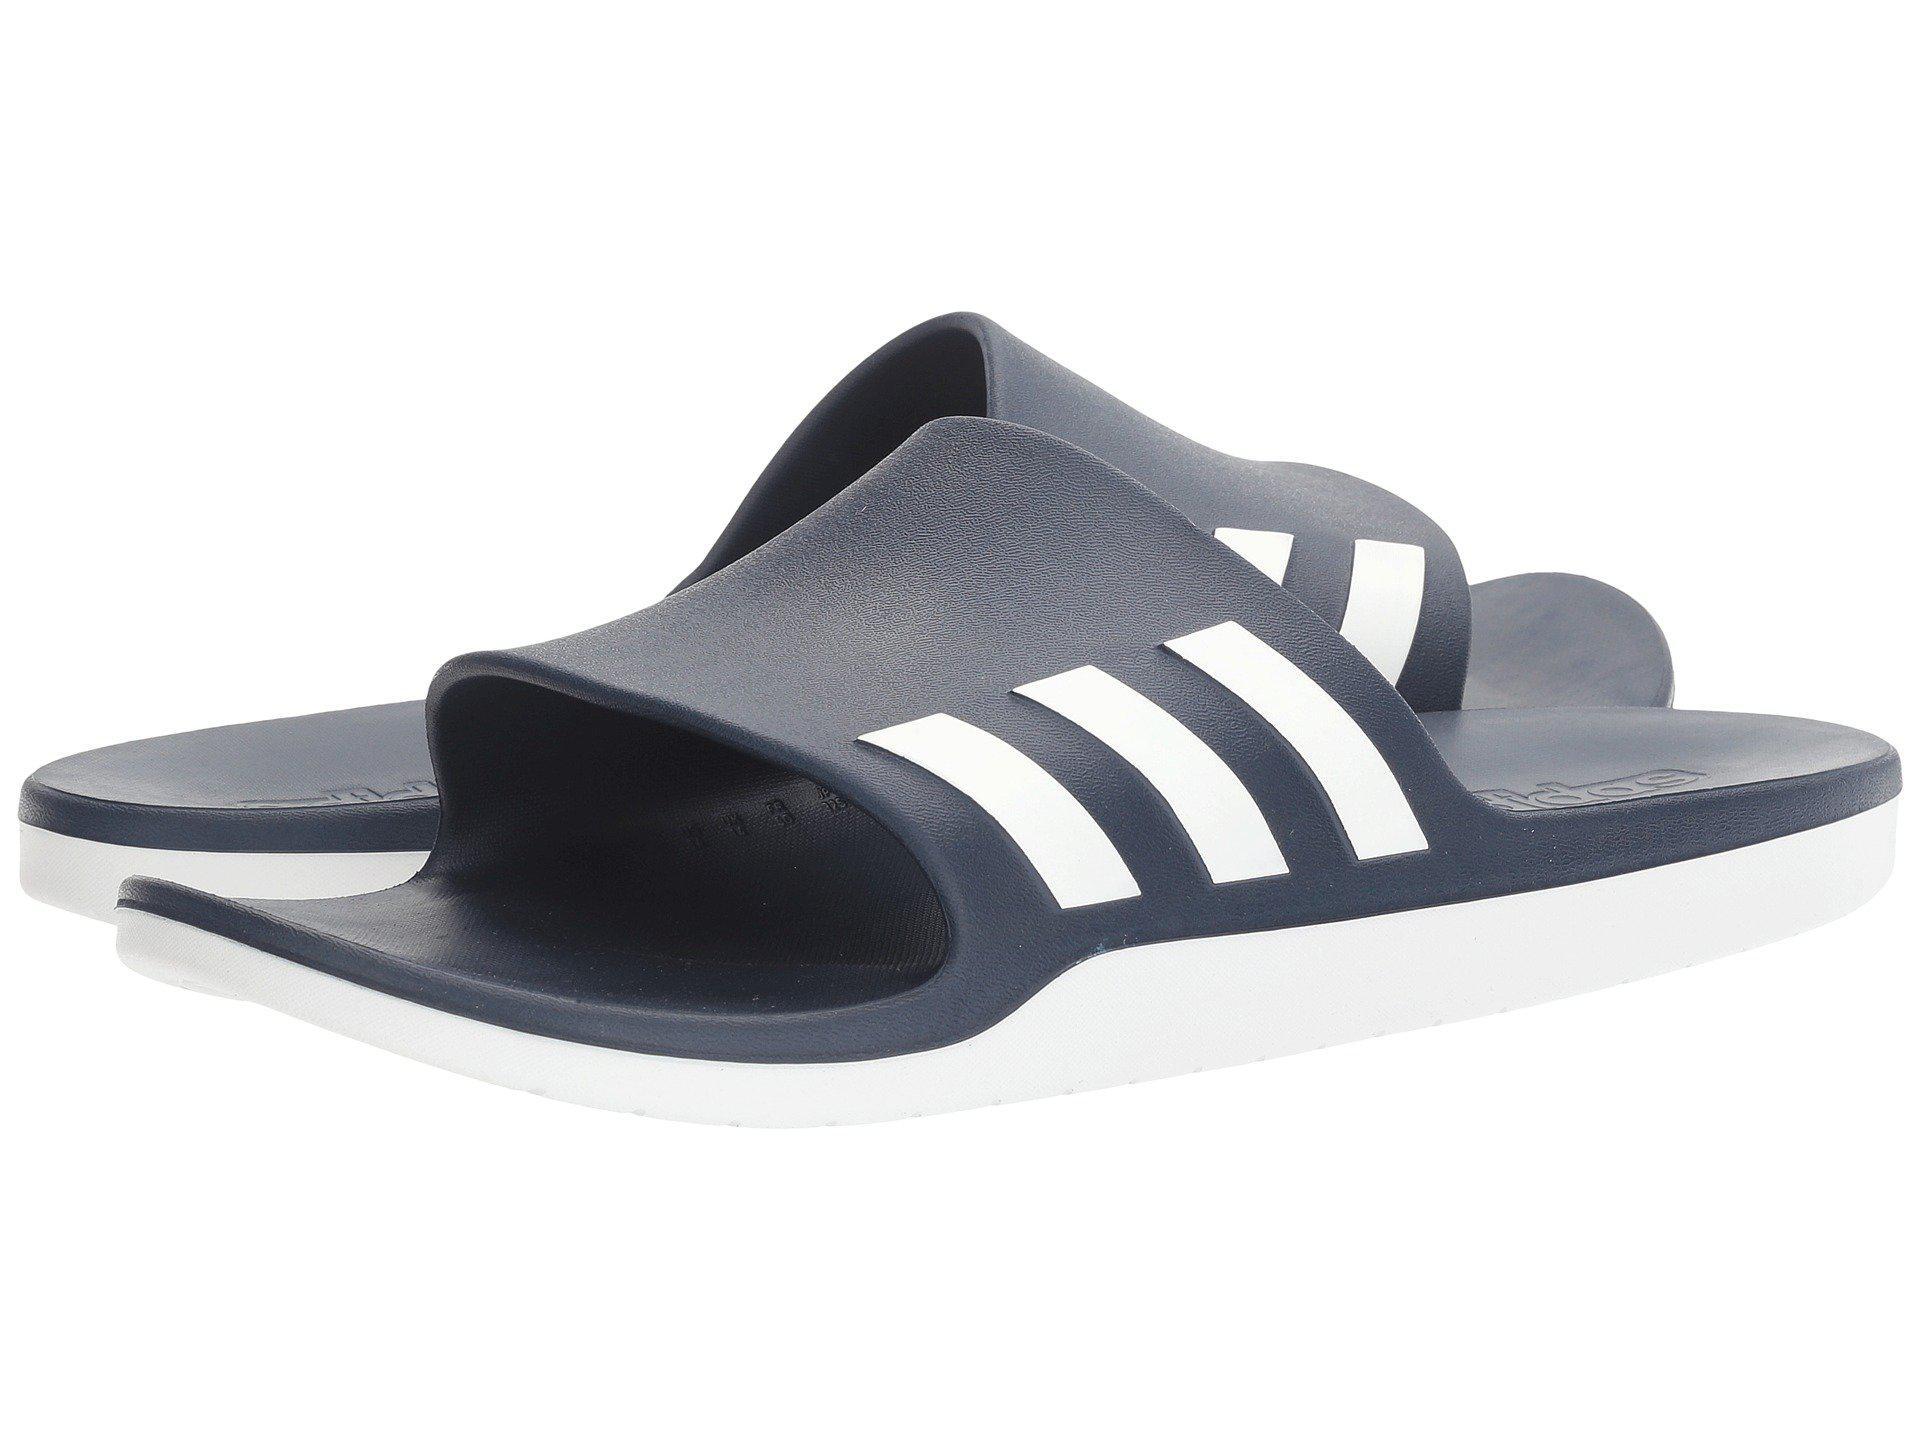 2f91e258bca938 Lyst - adidas Originals Adidas Aqualette Cf Athletic Sandal in Blue ...